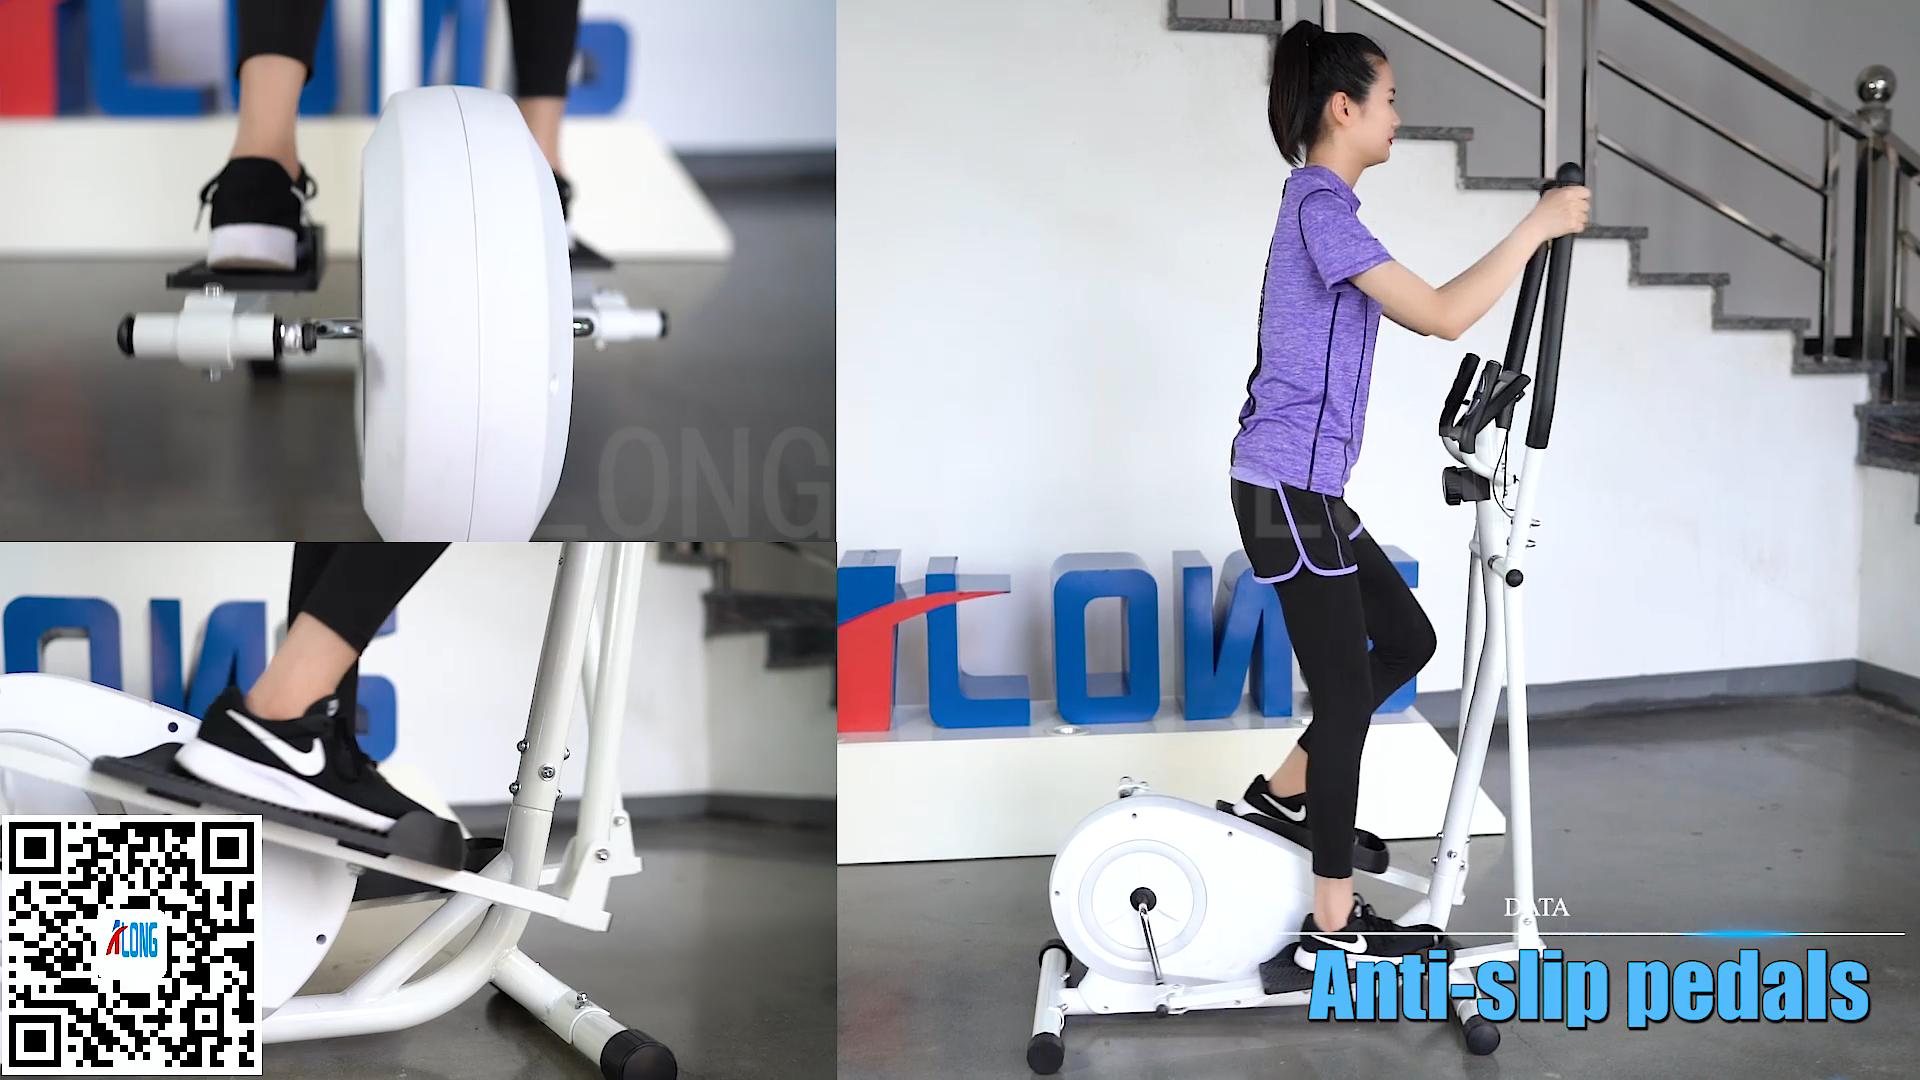 Fabbrica di buona qualità di vendita calda magnetica ellittica trainer esercizio coperta home gym fitness MET1502